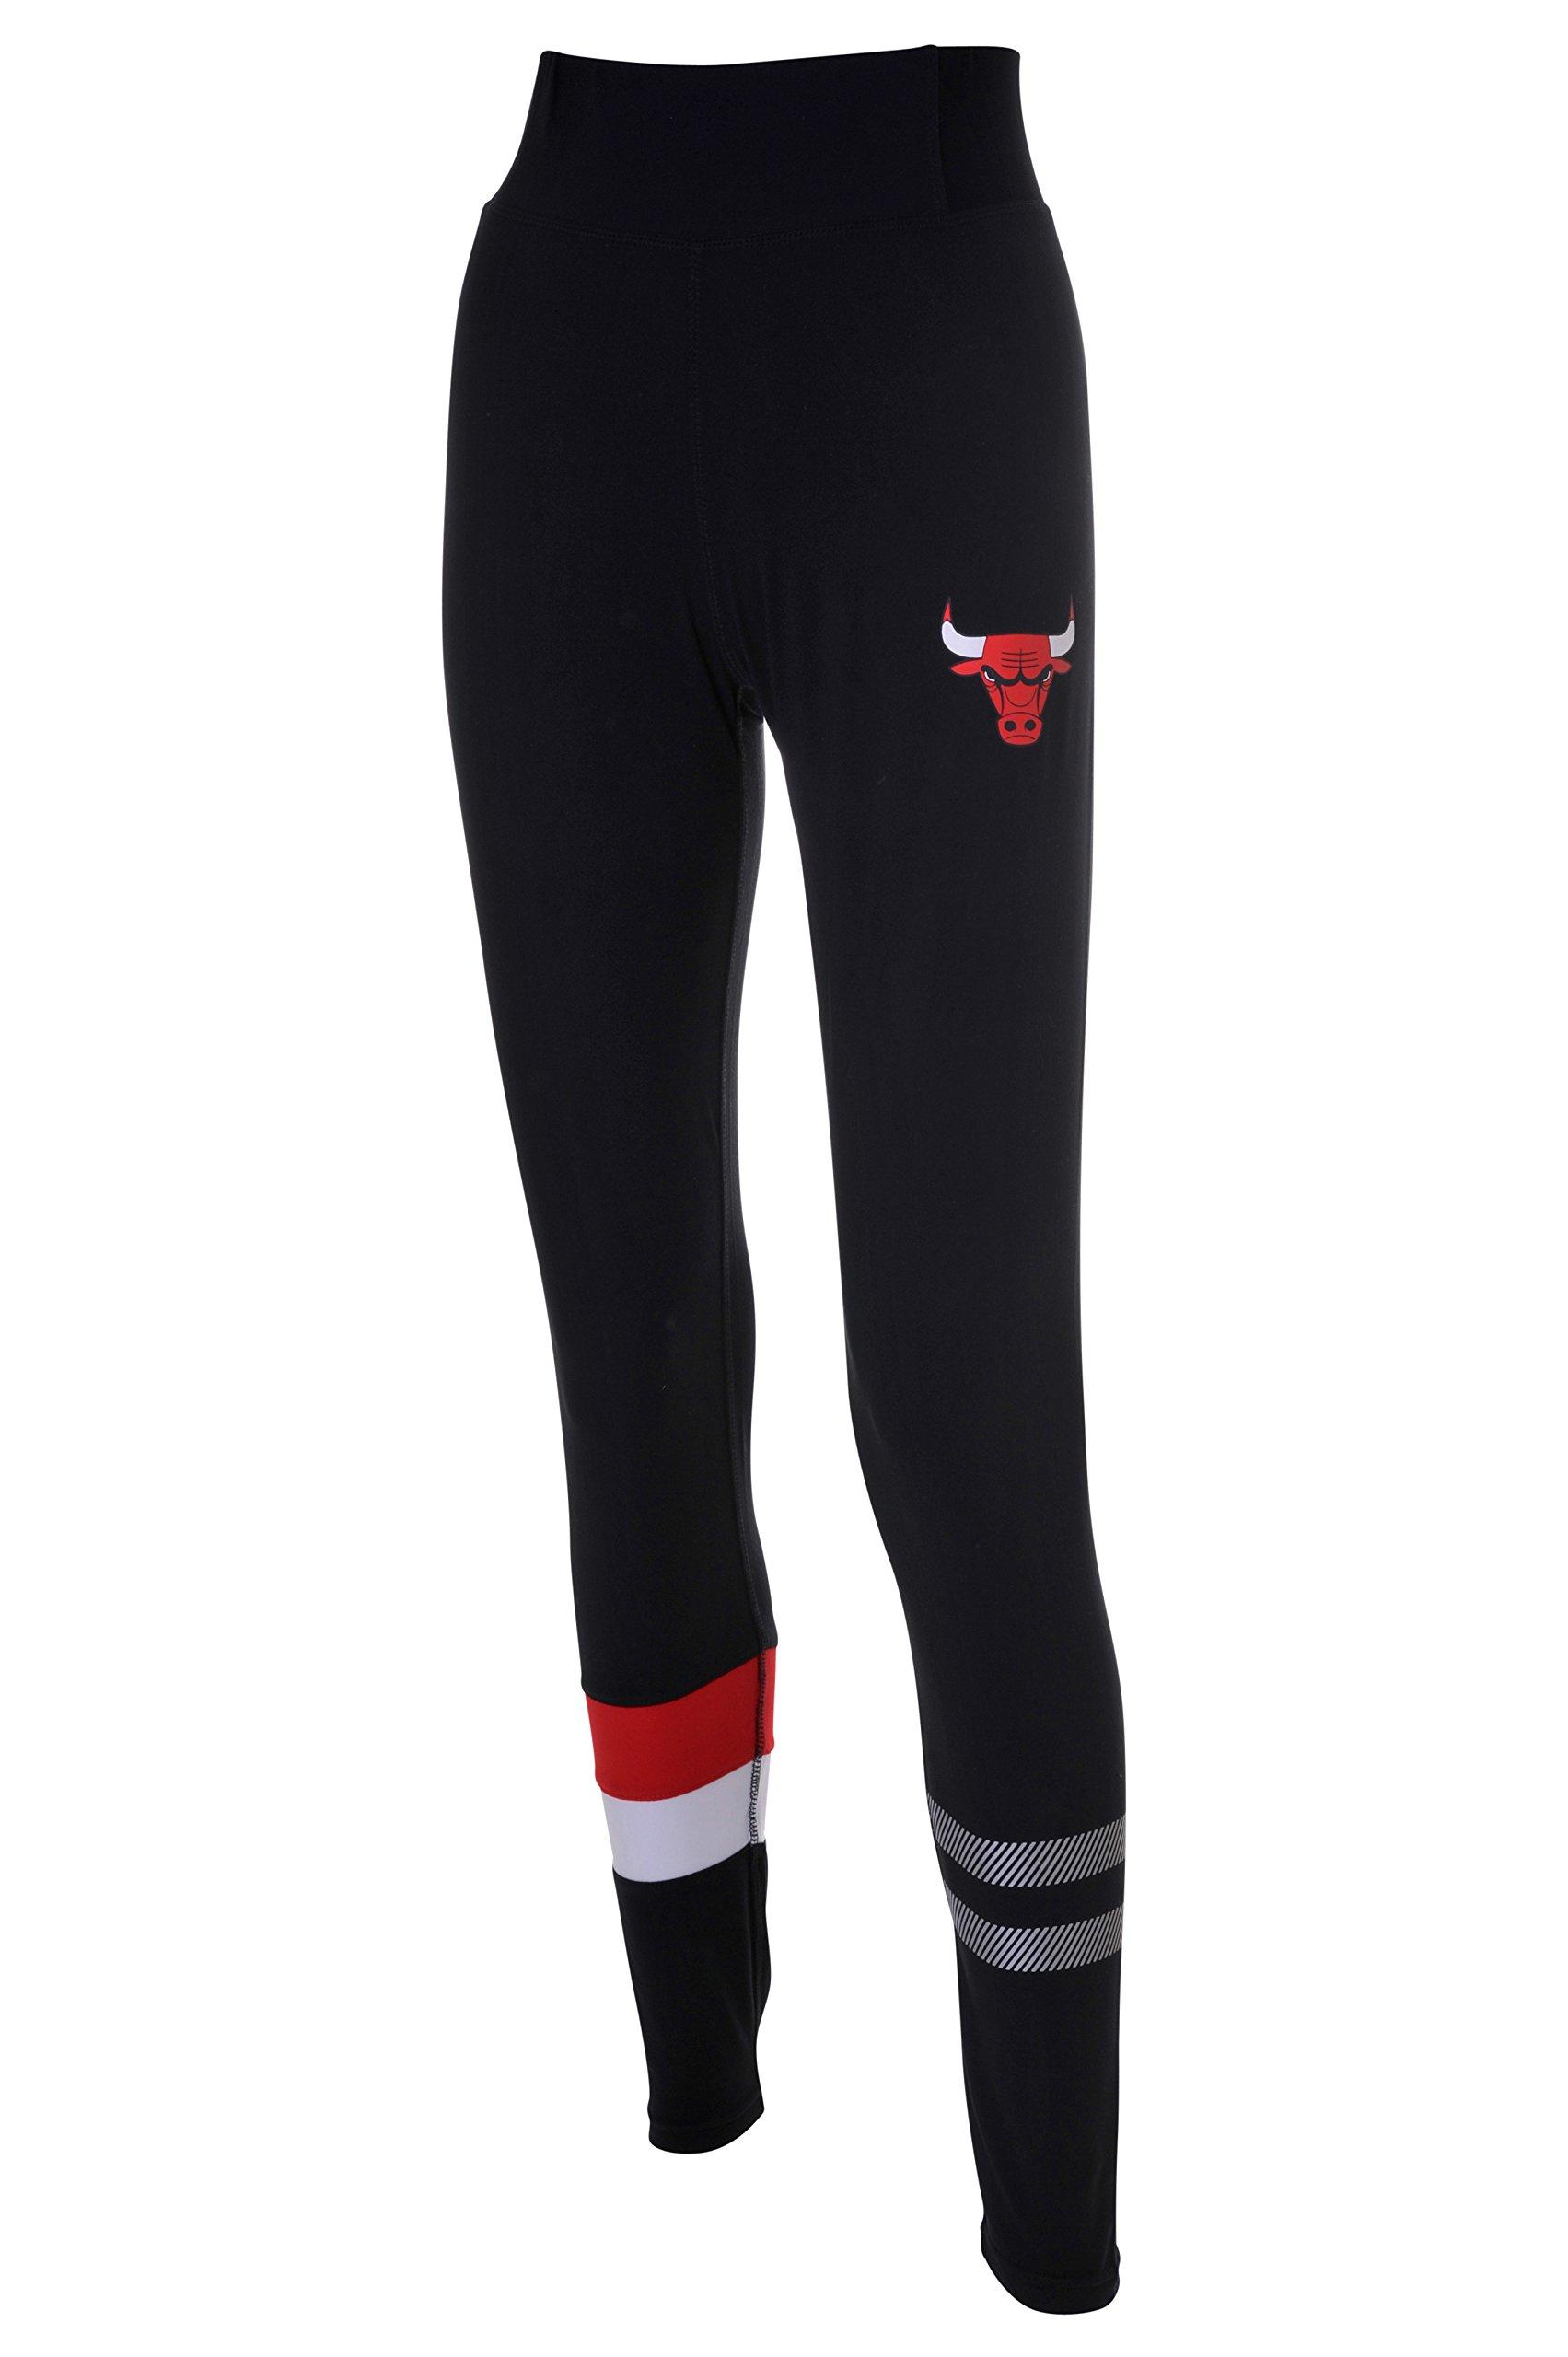 NBA Chicago Bulls Women's Leggings Perimeter Fitness Sport Yoga Pants, X-Large, Black